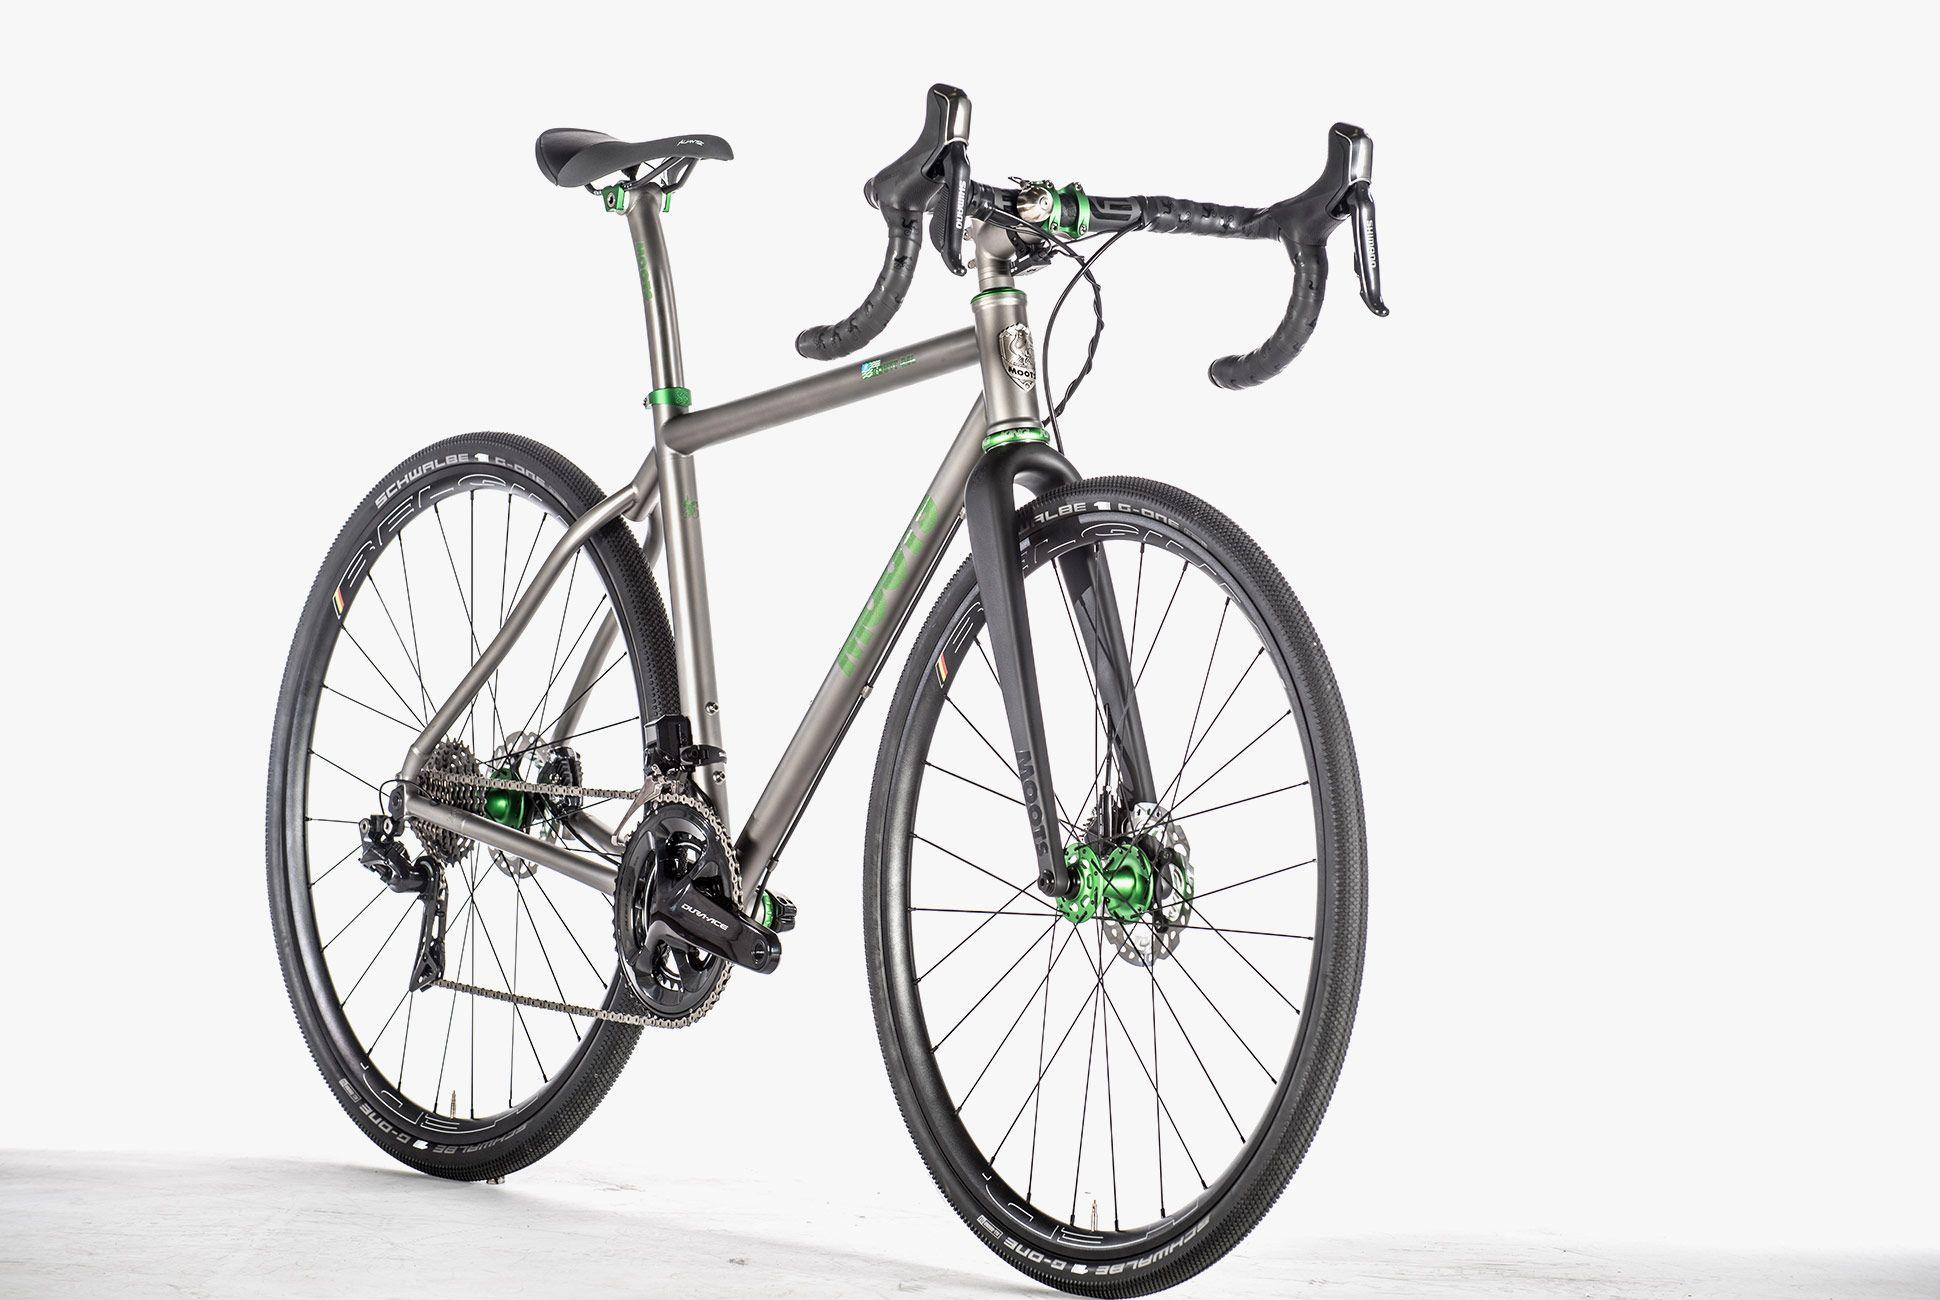 Bikes-From-NAHBS-Gear-Patrol-29